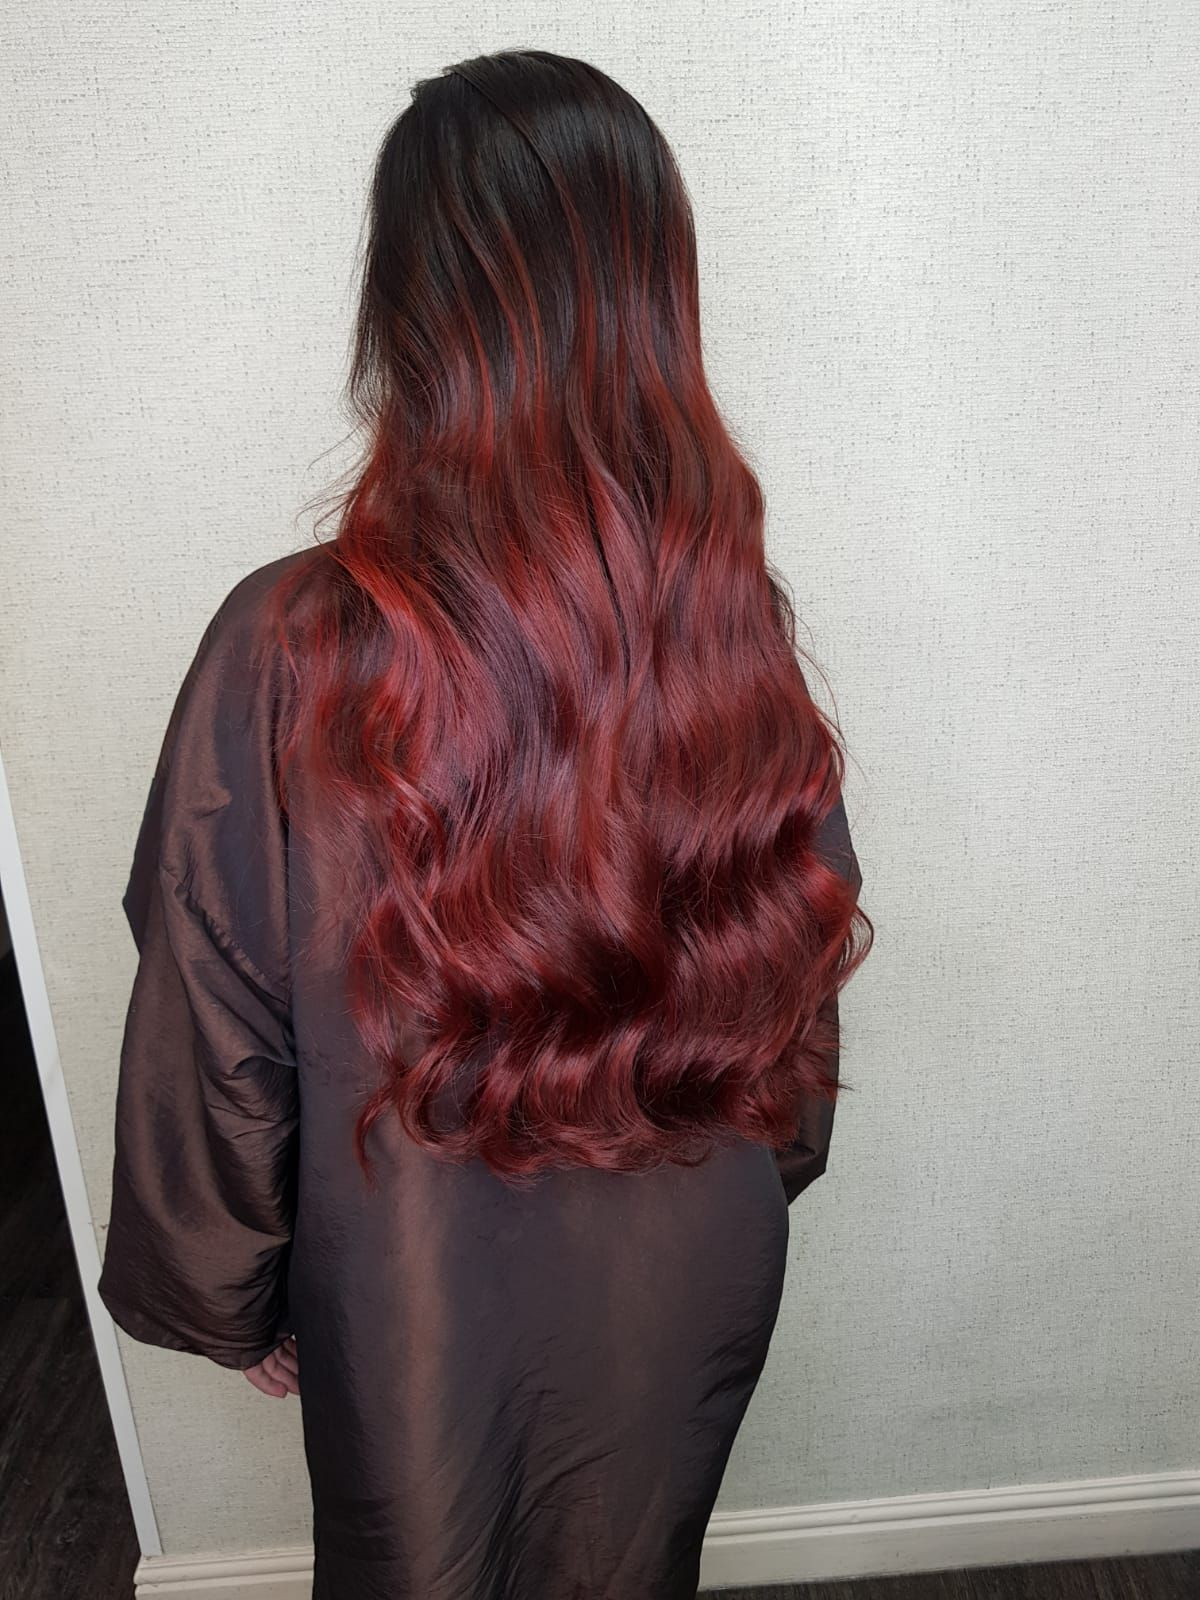 Pin By Shabana Ahmed On Hair Long Hair Styles Hair Styles Dyed Hair